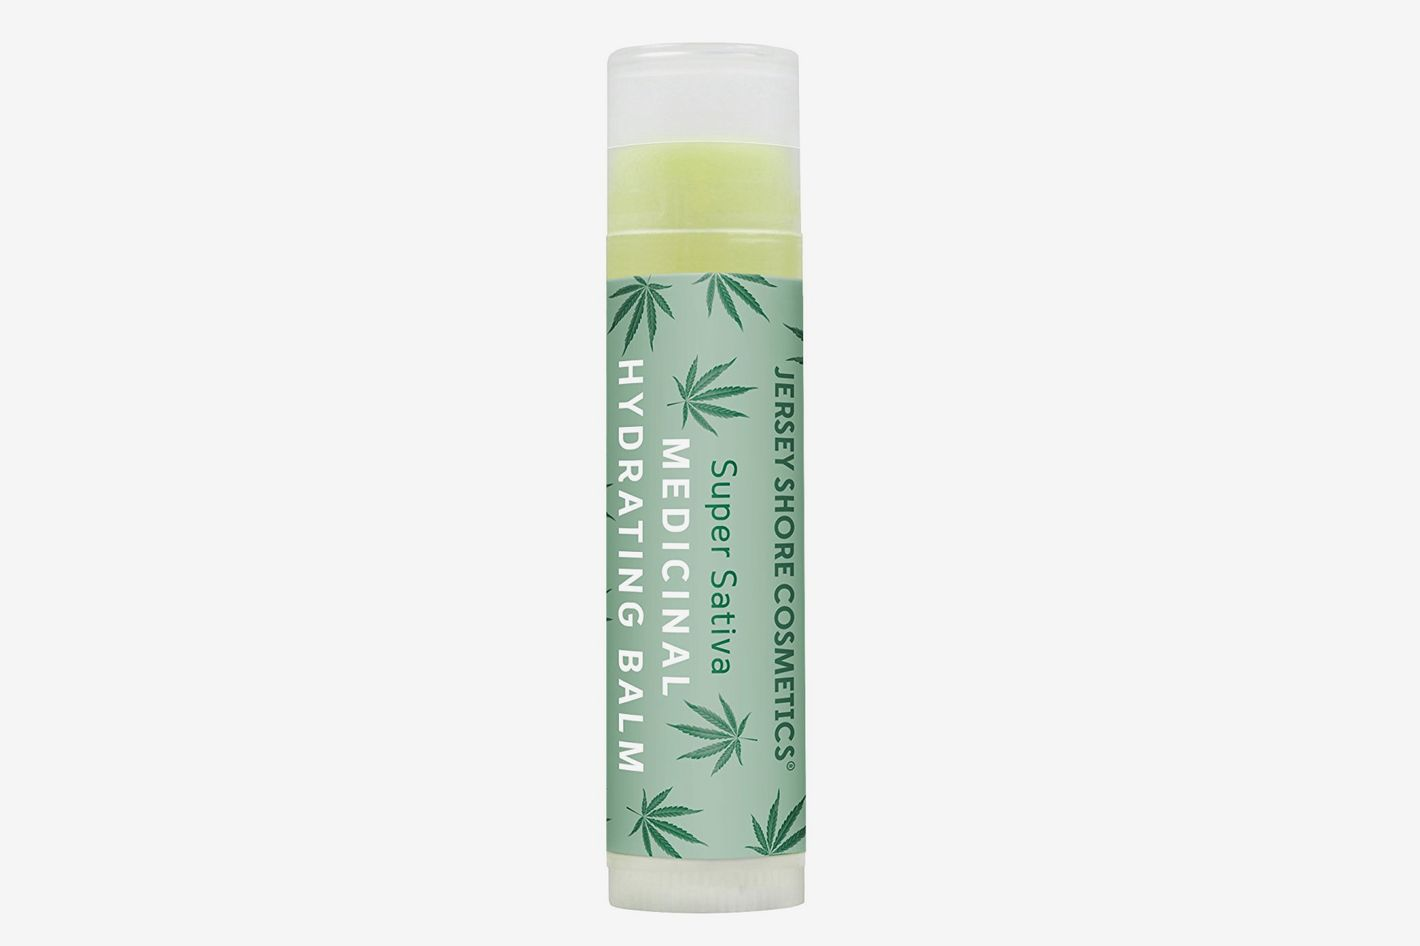 Jersey Shore Cosmetics Super Sativa Medicinal Hydrating Lip Balm